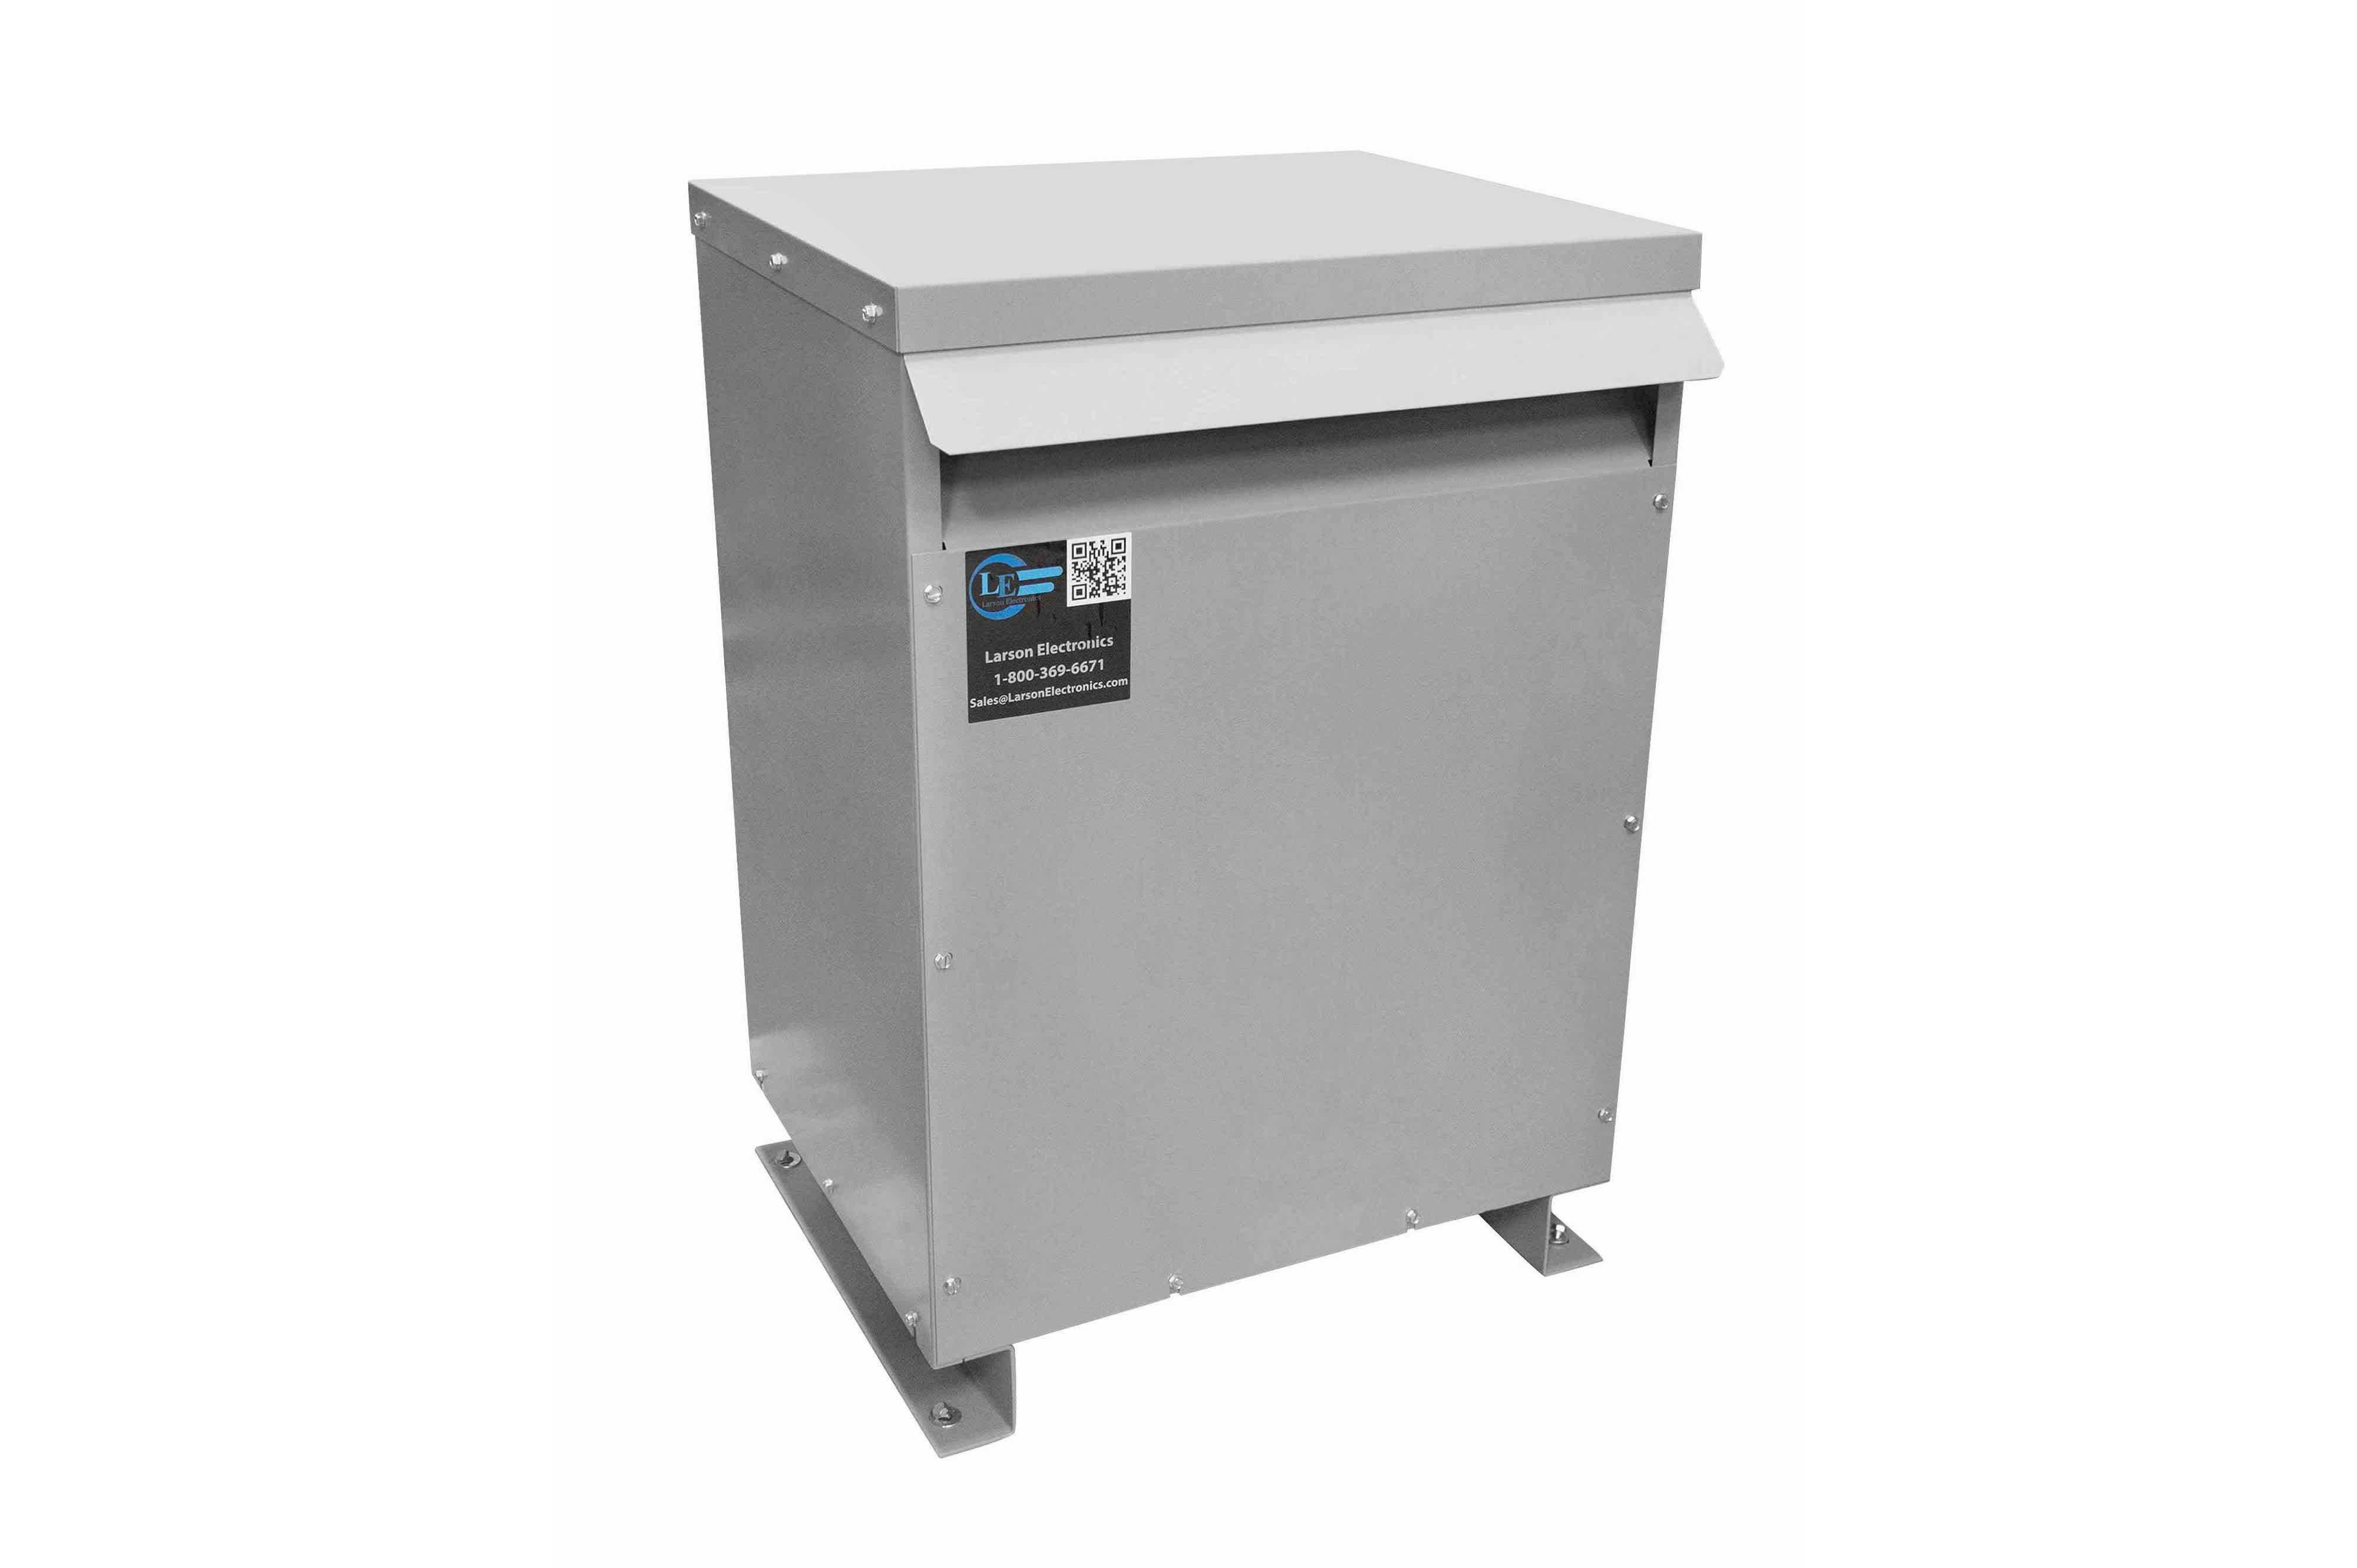 300 kVA 3PH Isolation Transformer, 400V Wye Primary, 240V/120 Delta Secondary, N3R, Ventilated, 60 Hz